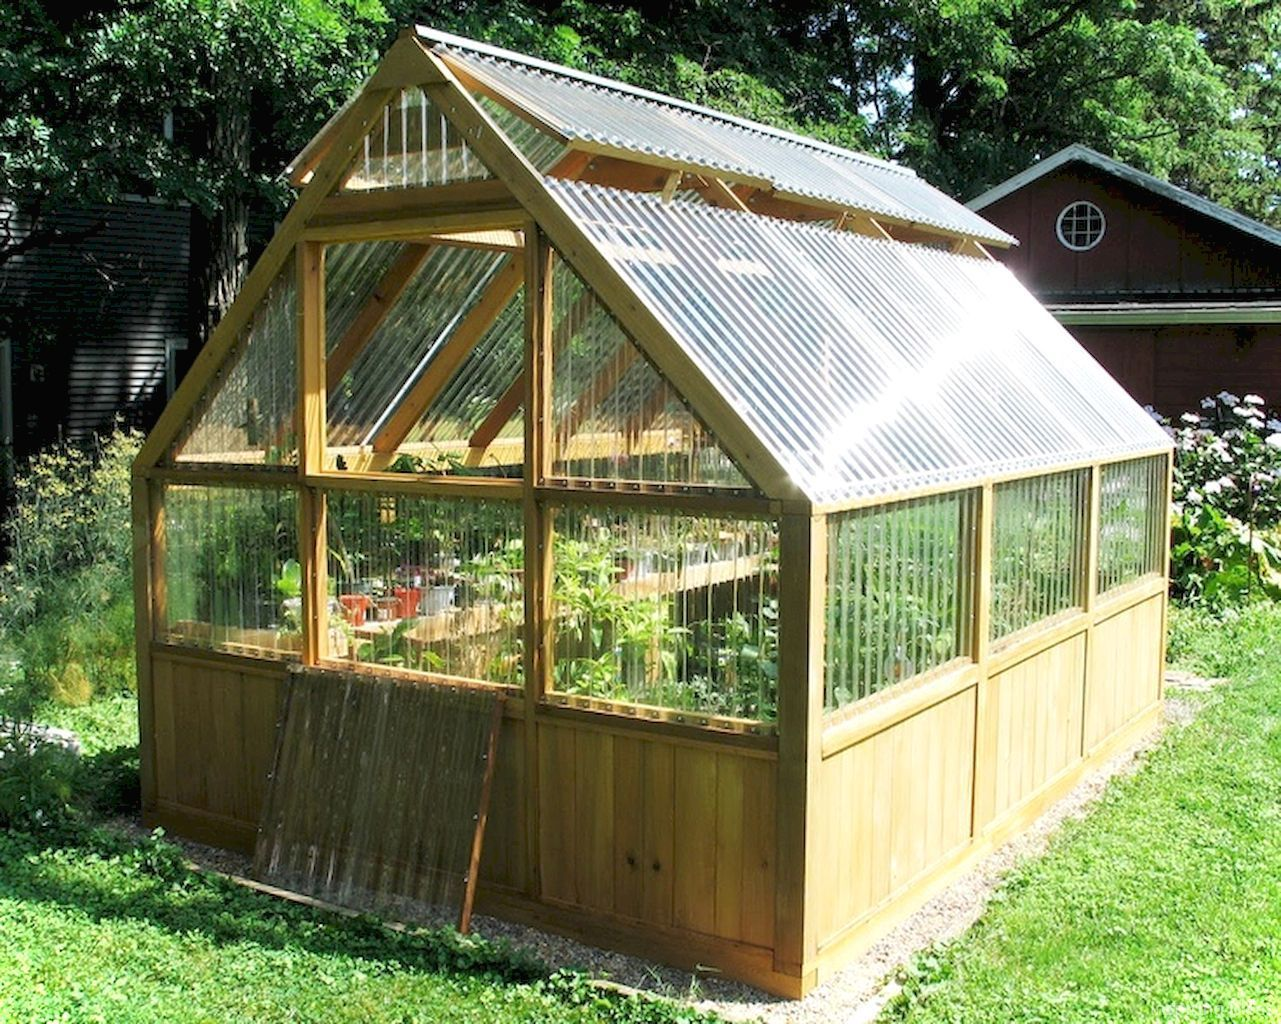 28 Awesome Garden Shed Design Ideas Backyard Greenhouse Diy Greenhouse Plans Greenhouse Shed Small backyard greenhouse kit